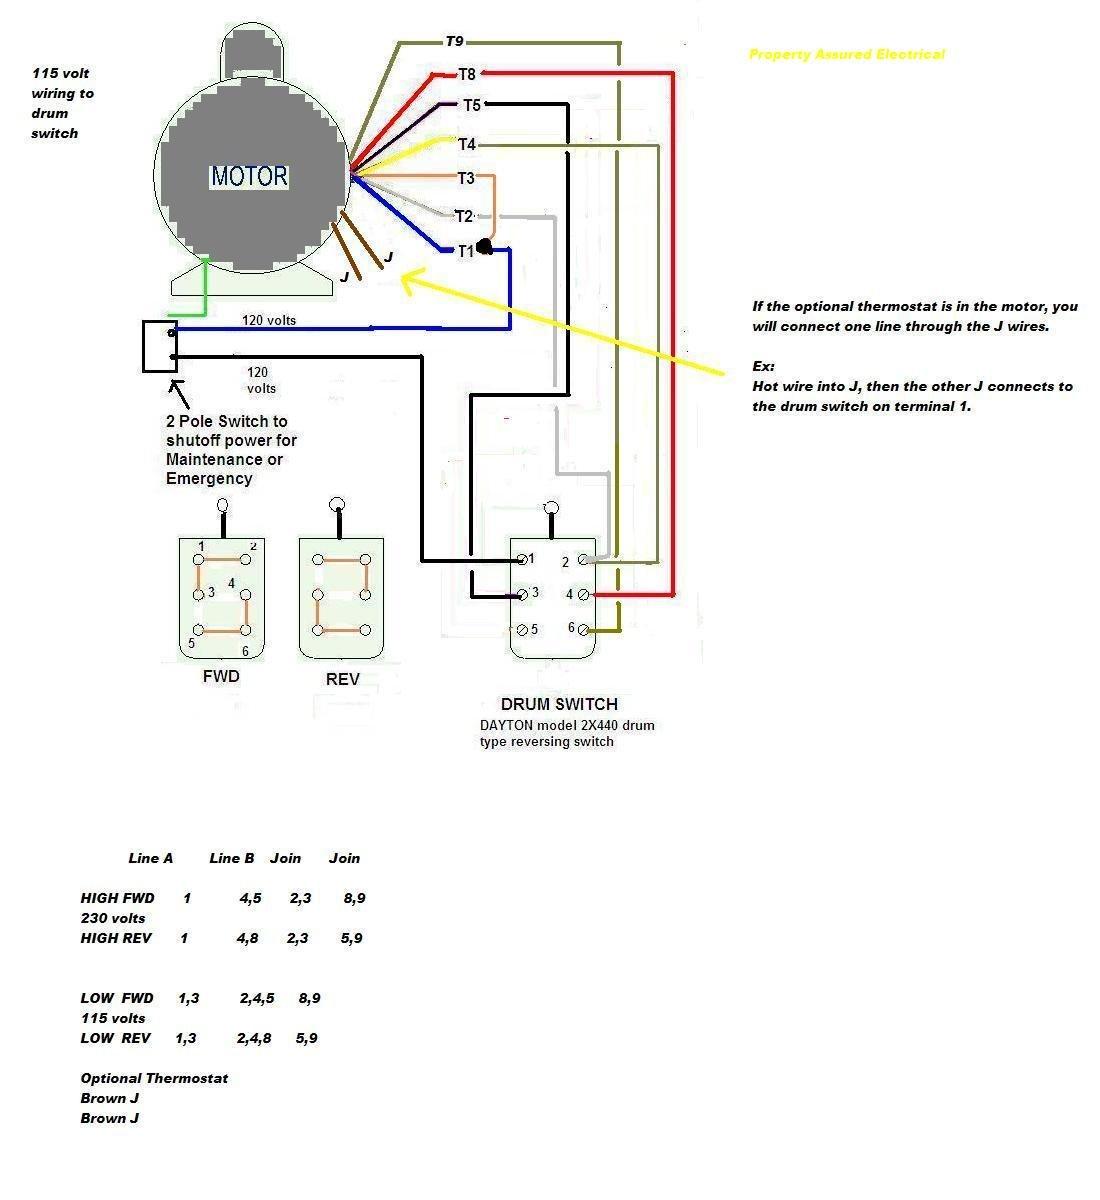 Wiring Diagram For A Dayton 4x796 Motor Speed Control